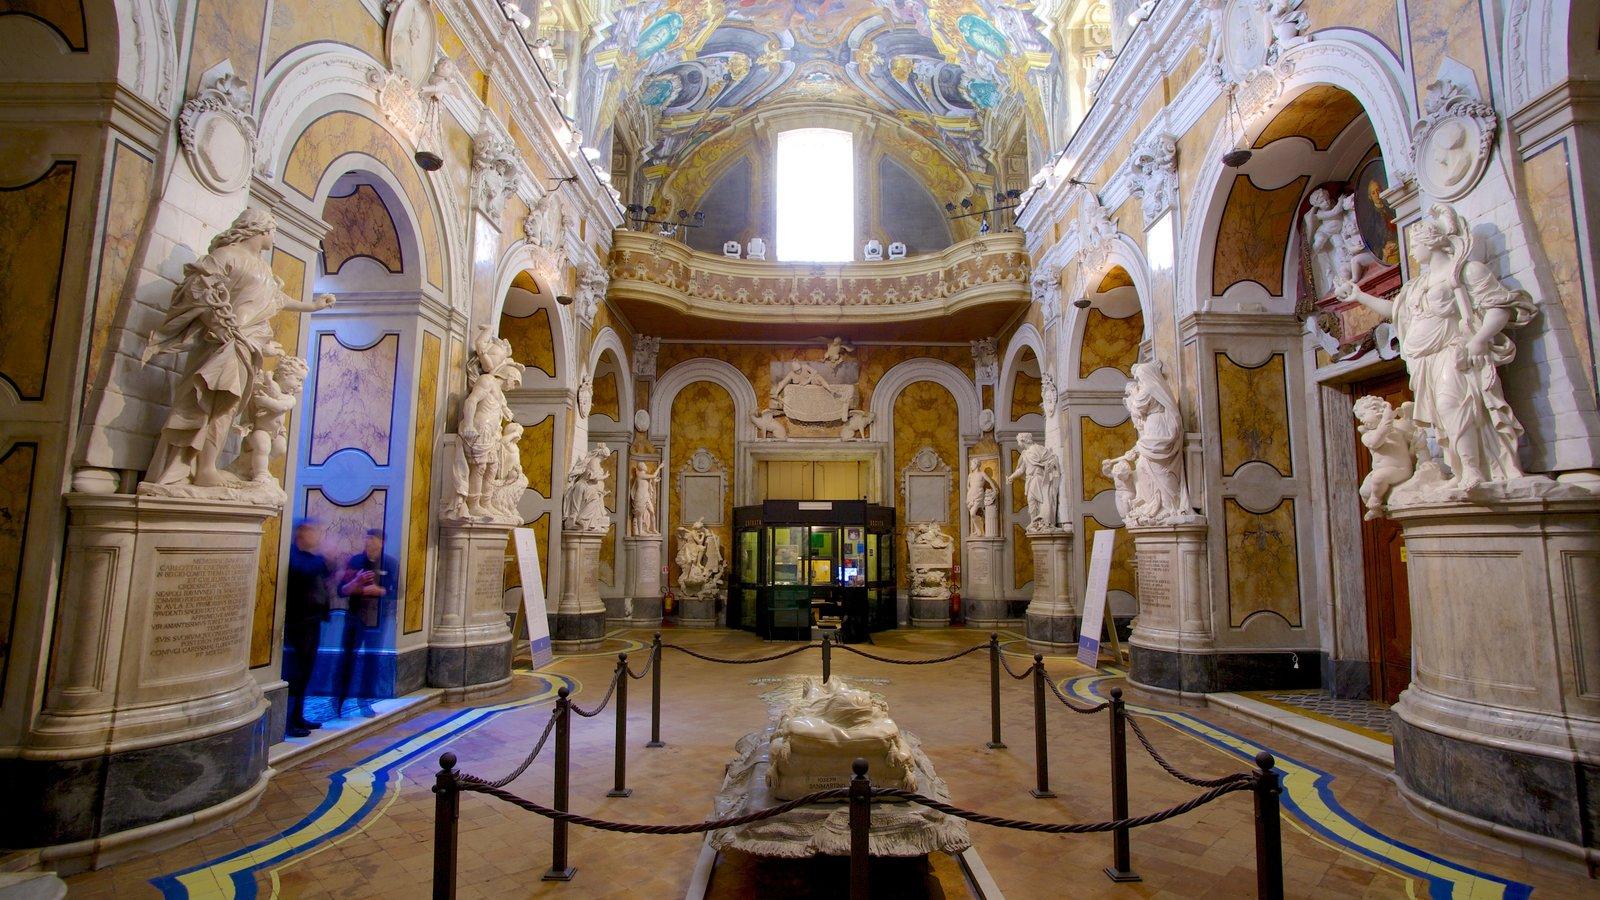 La Cappella Sansevero que inclui uma igreja ou catedral, aspectos religiosos e arquitetura de patrimônio